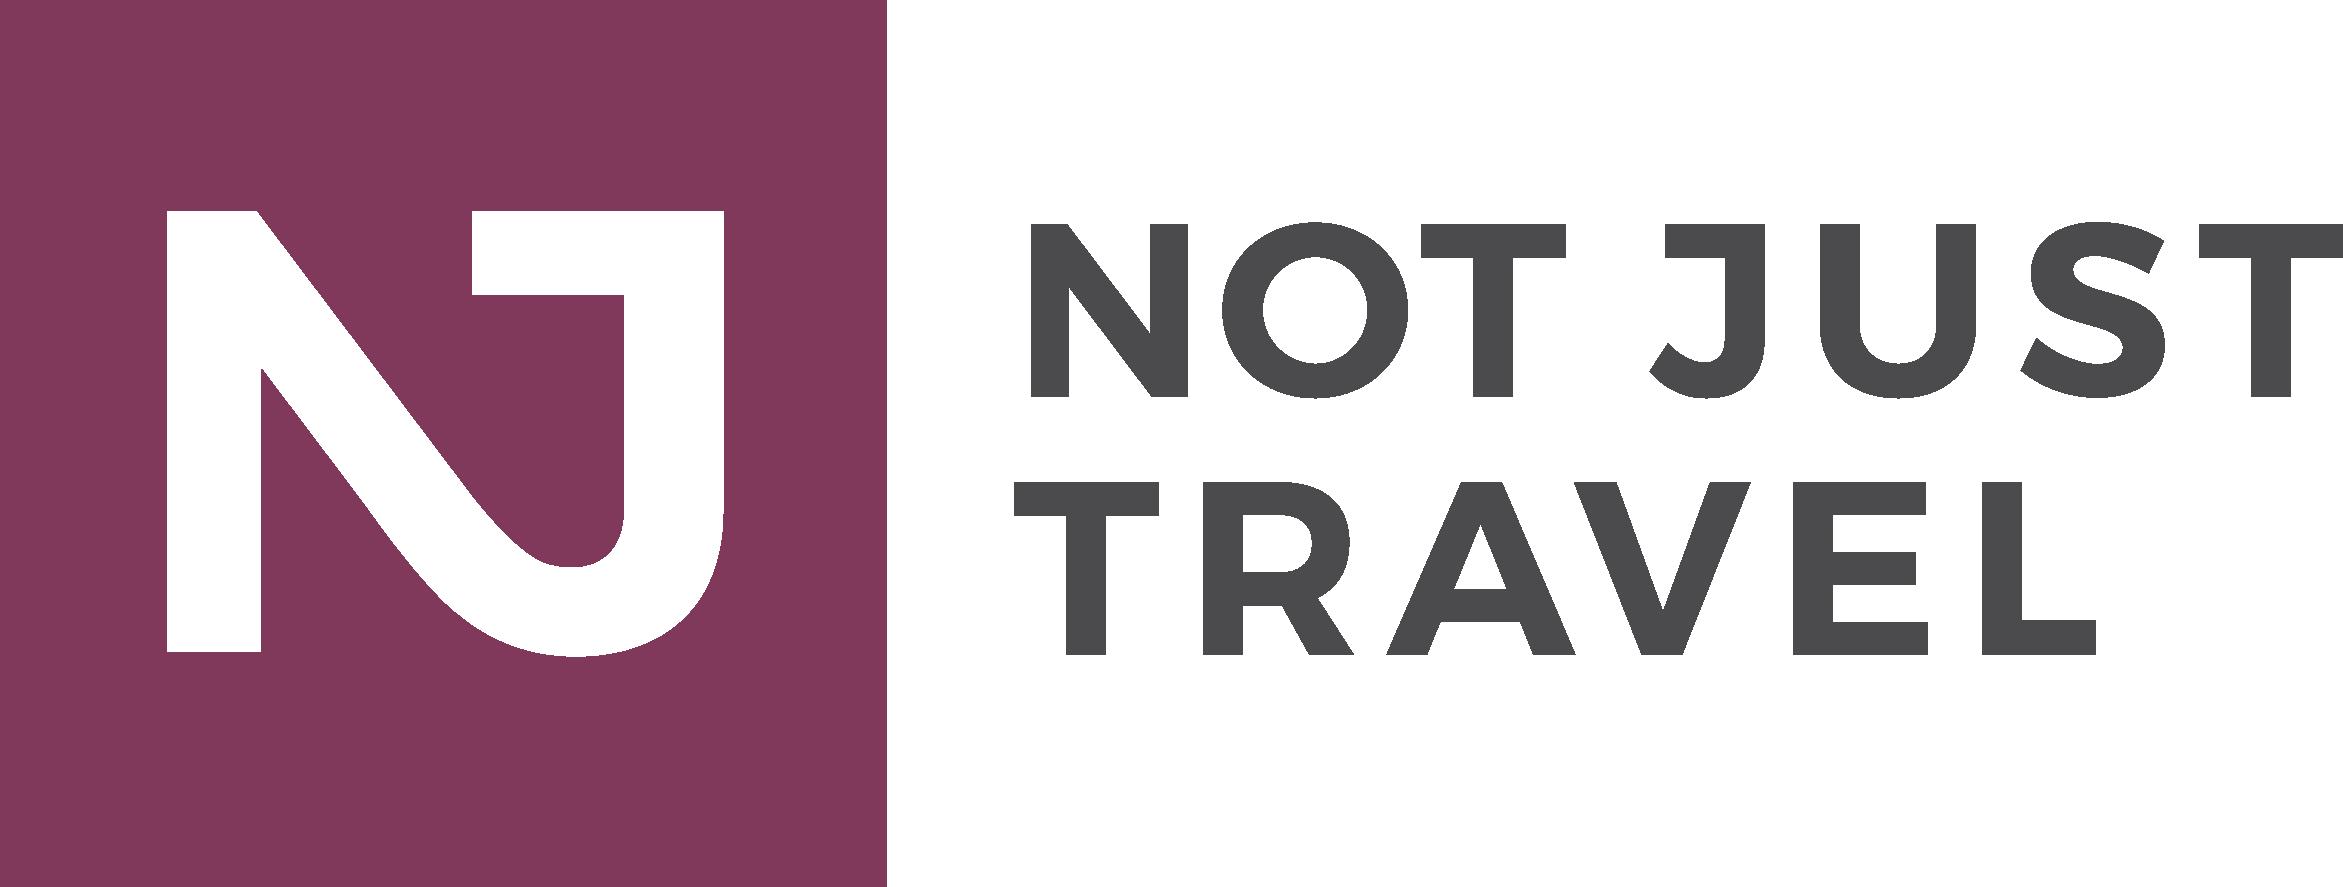 http://Not%20Just%20Travel%20Northwest